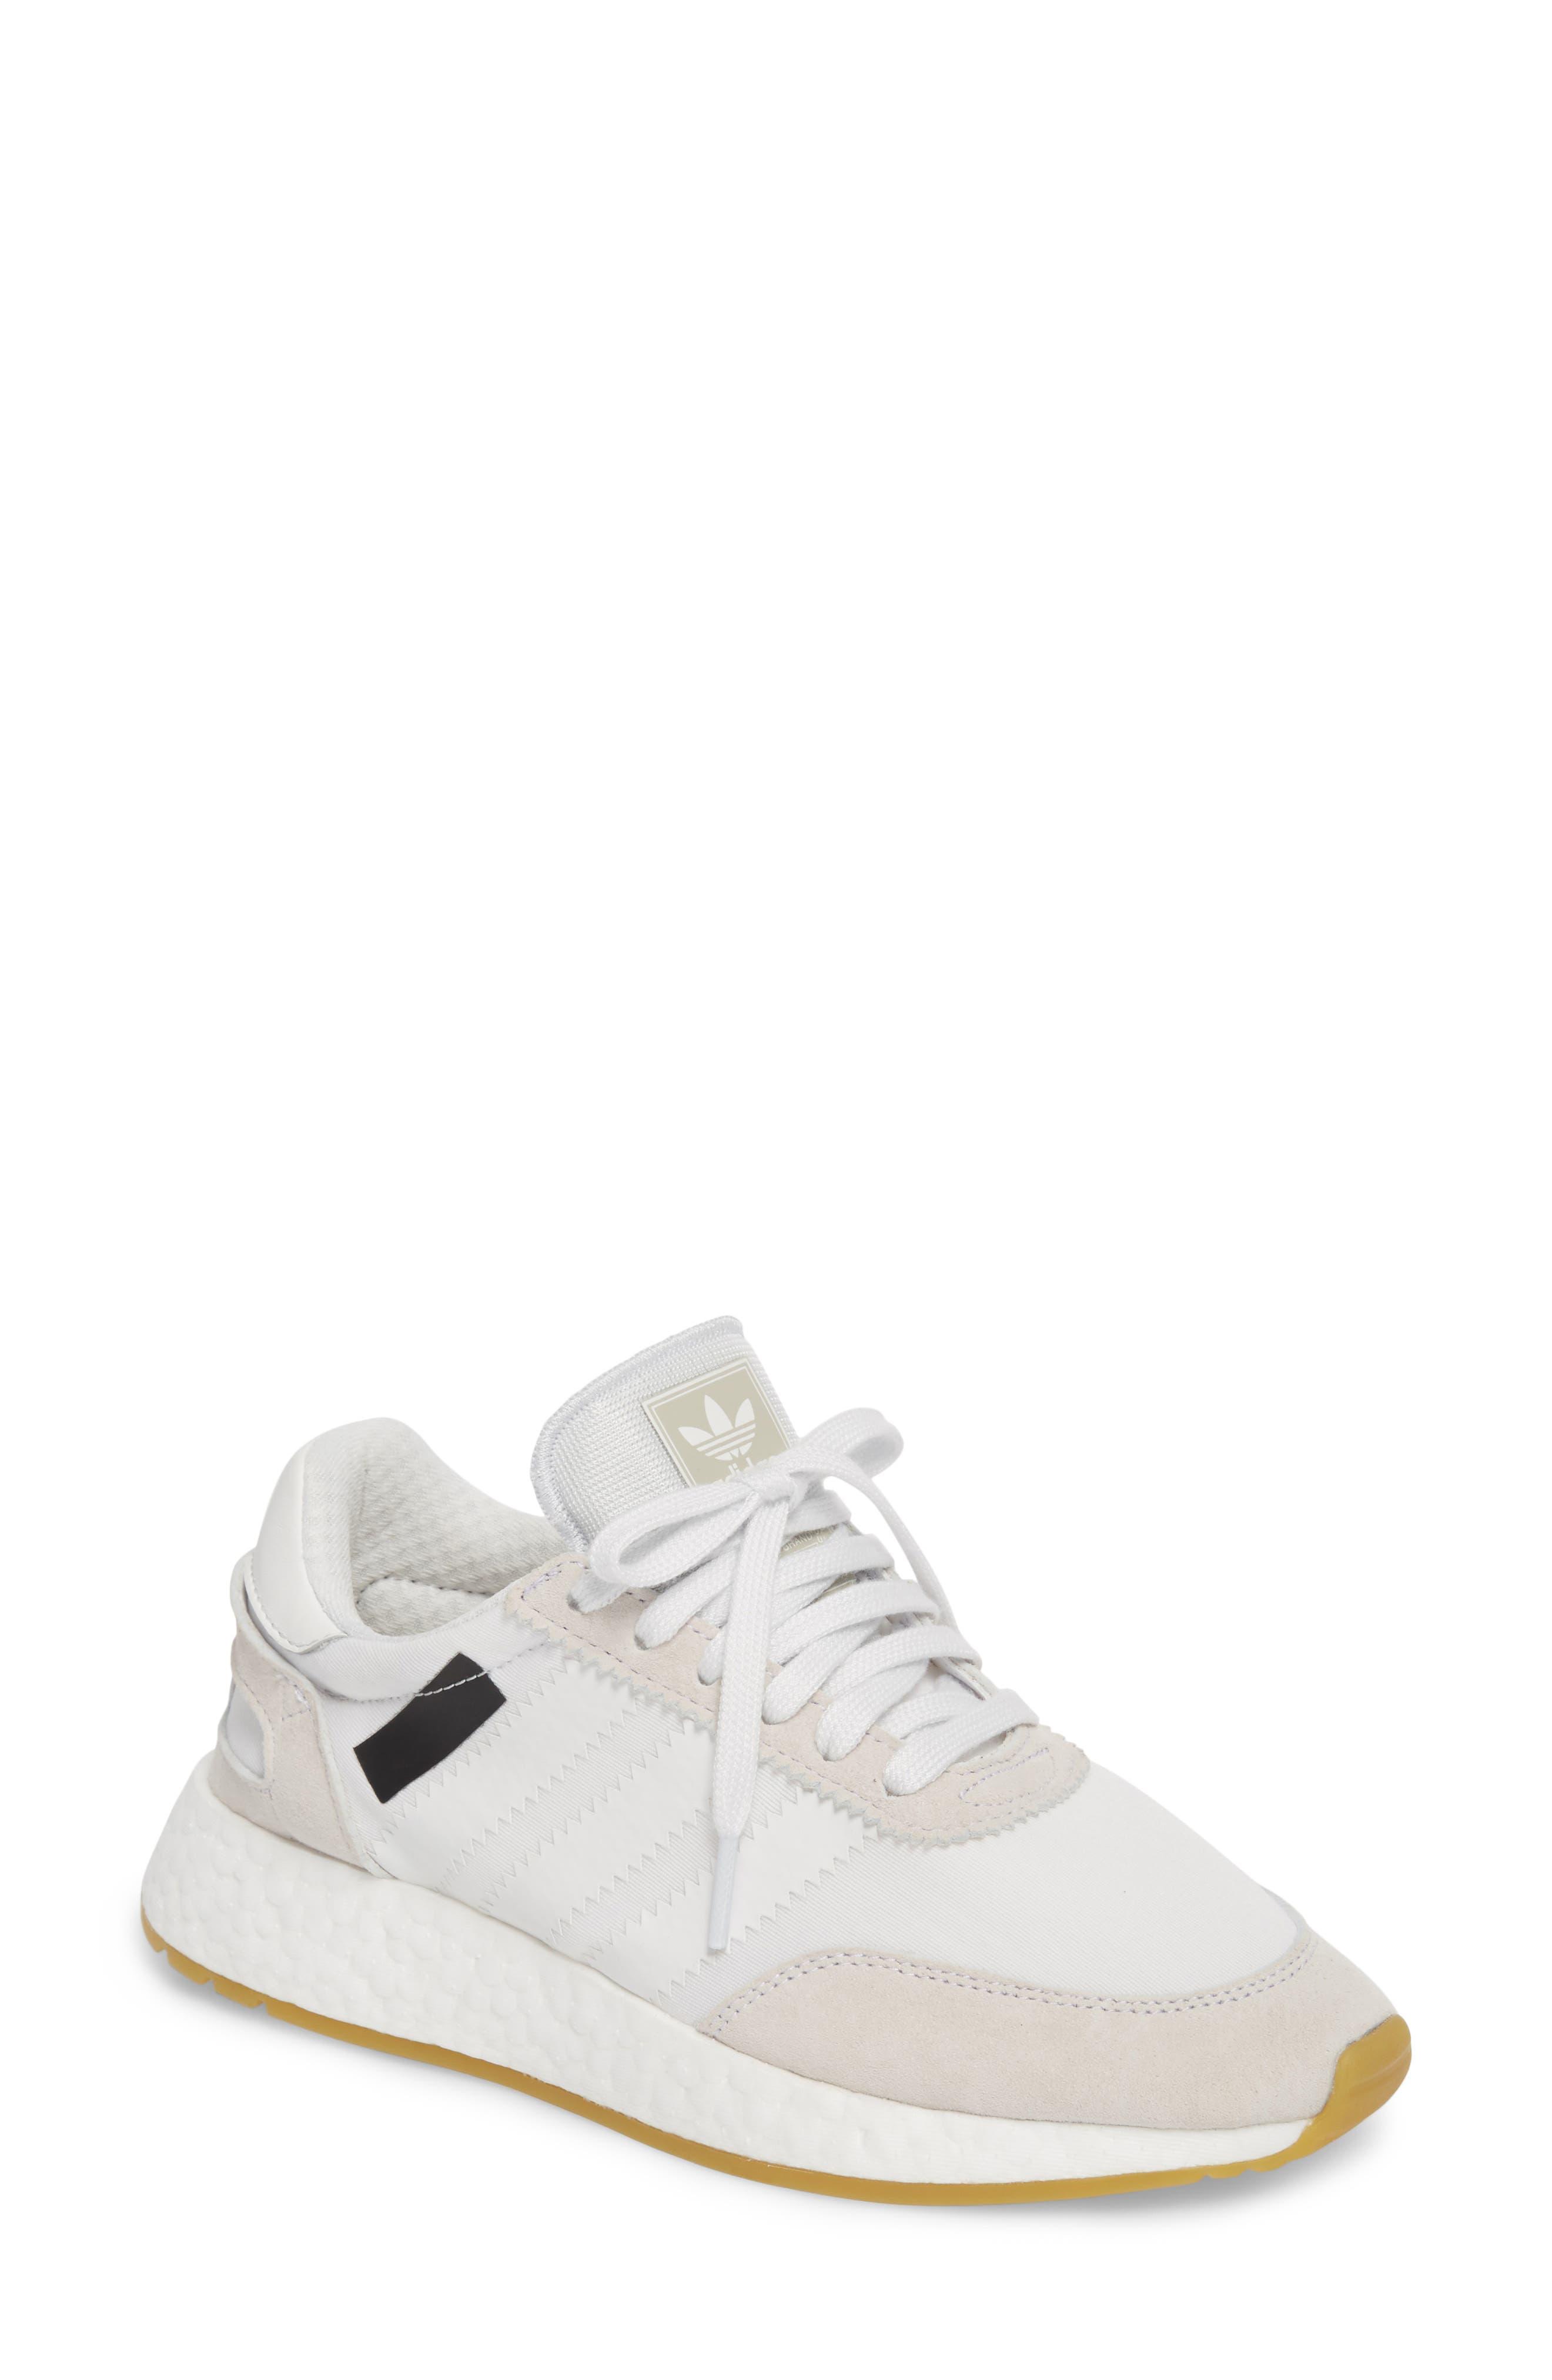 I-5923 Sneaker,                             Main thumbnail 1, color,                             100